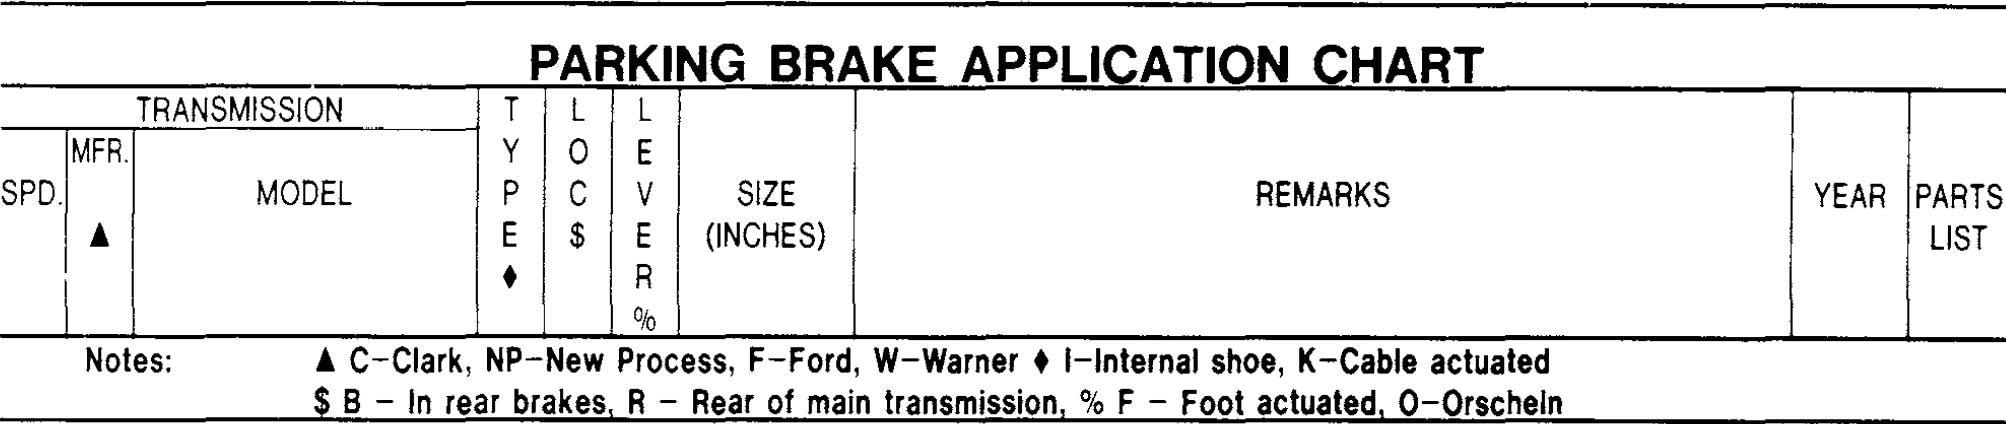 Brakes - Gary's Garagemahal (the Bullnose bible)